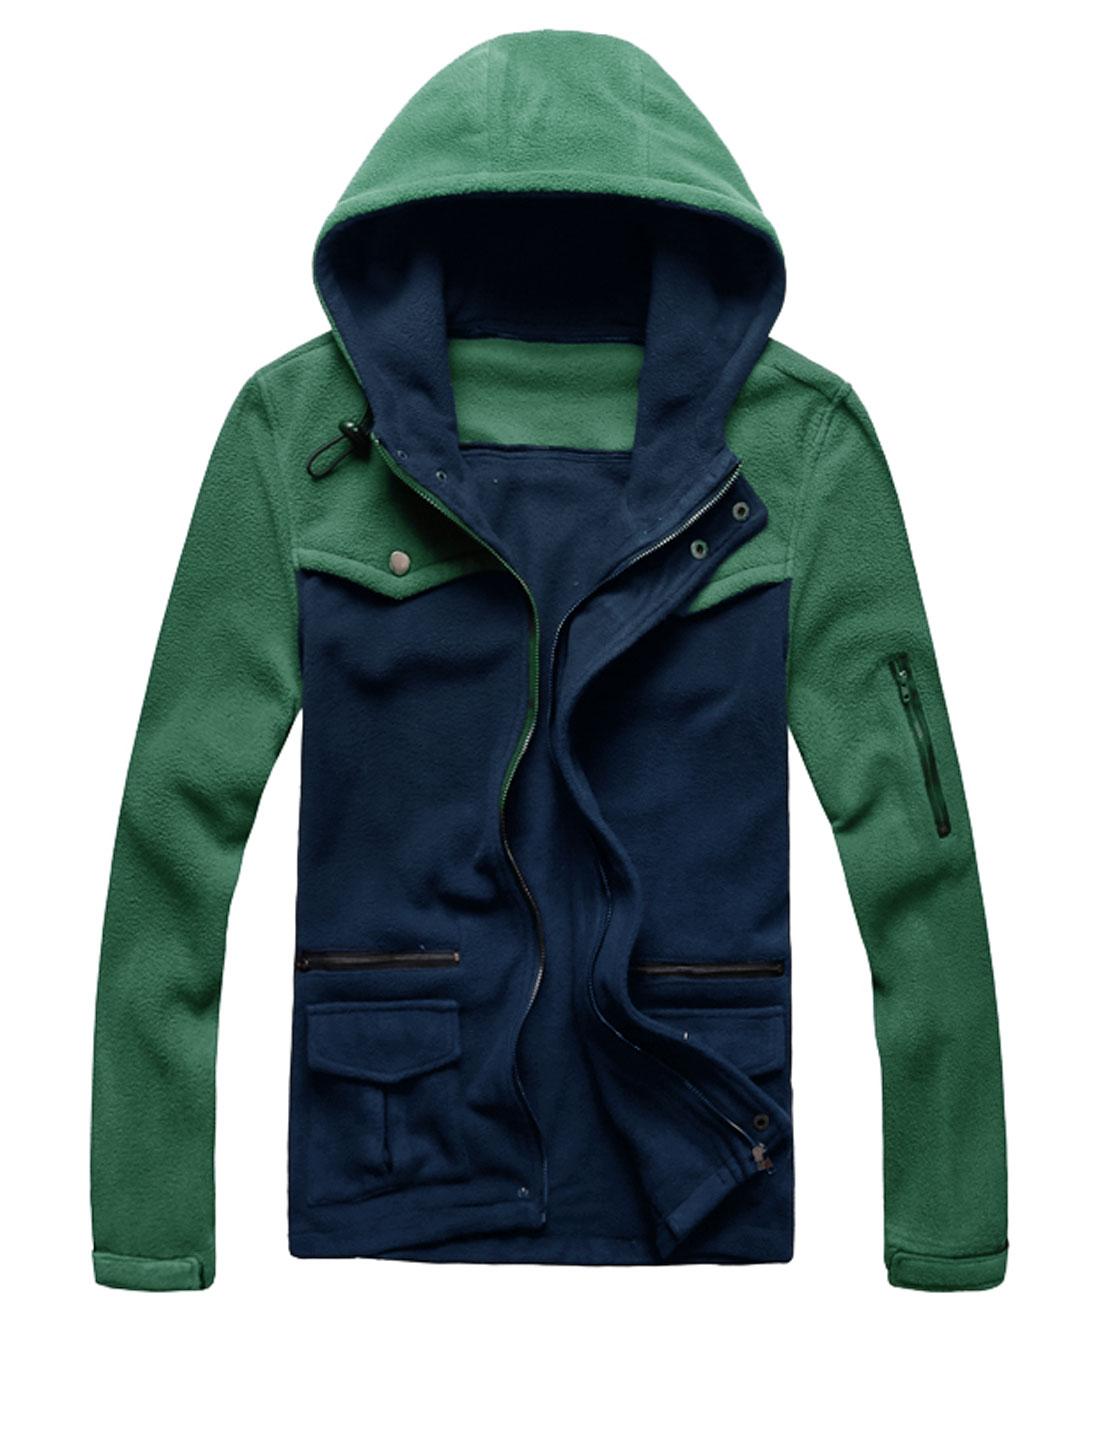 Men Hooded Drawcord Design Contrast Color Fleece Jacket Green Navy Blue M